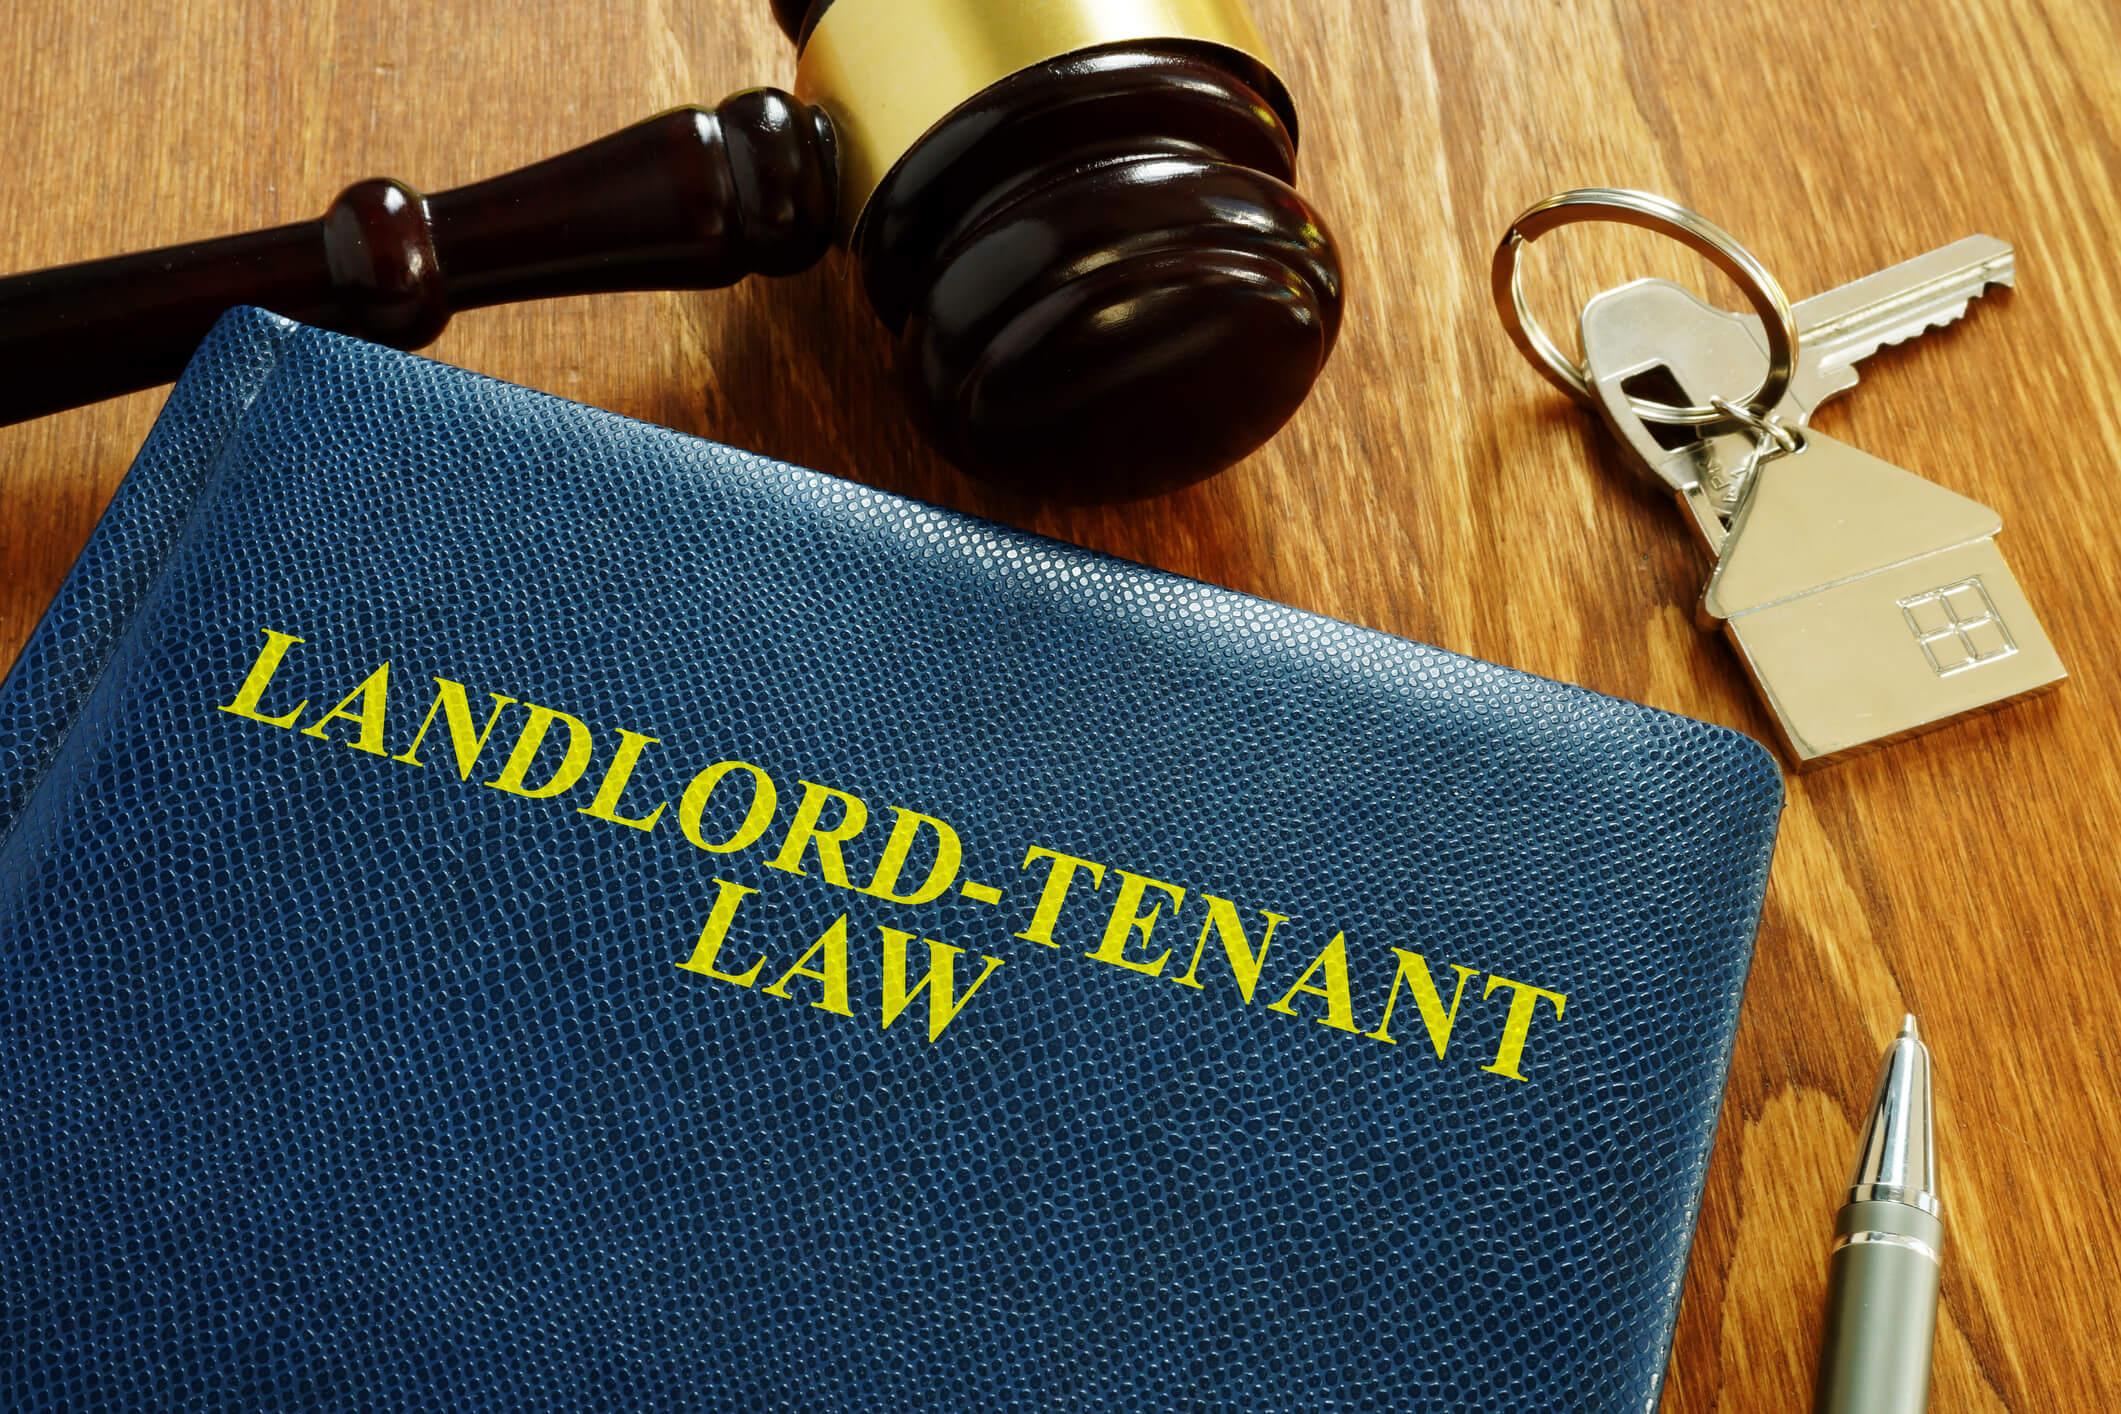 jacksonville landlord tenant laws